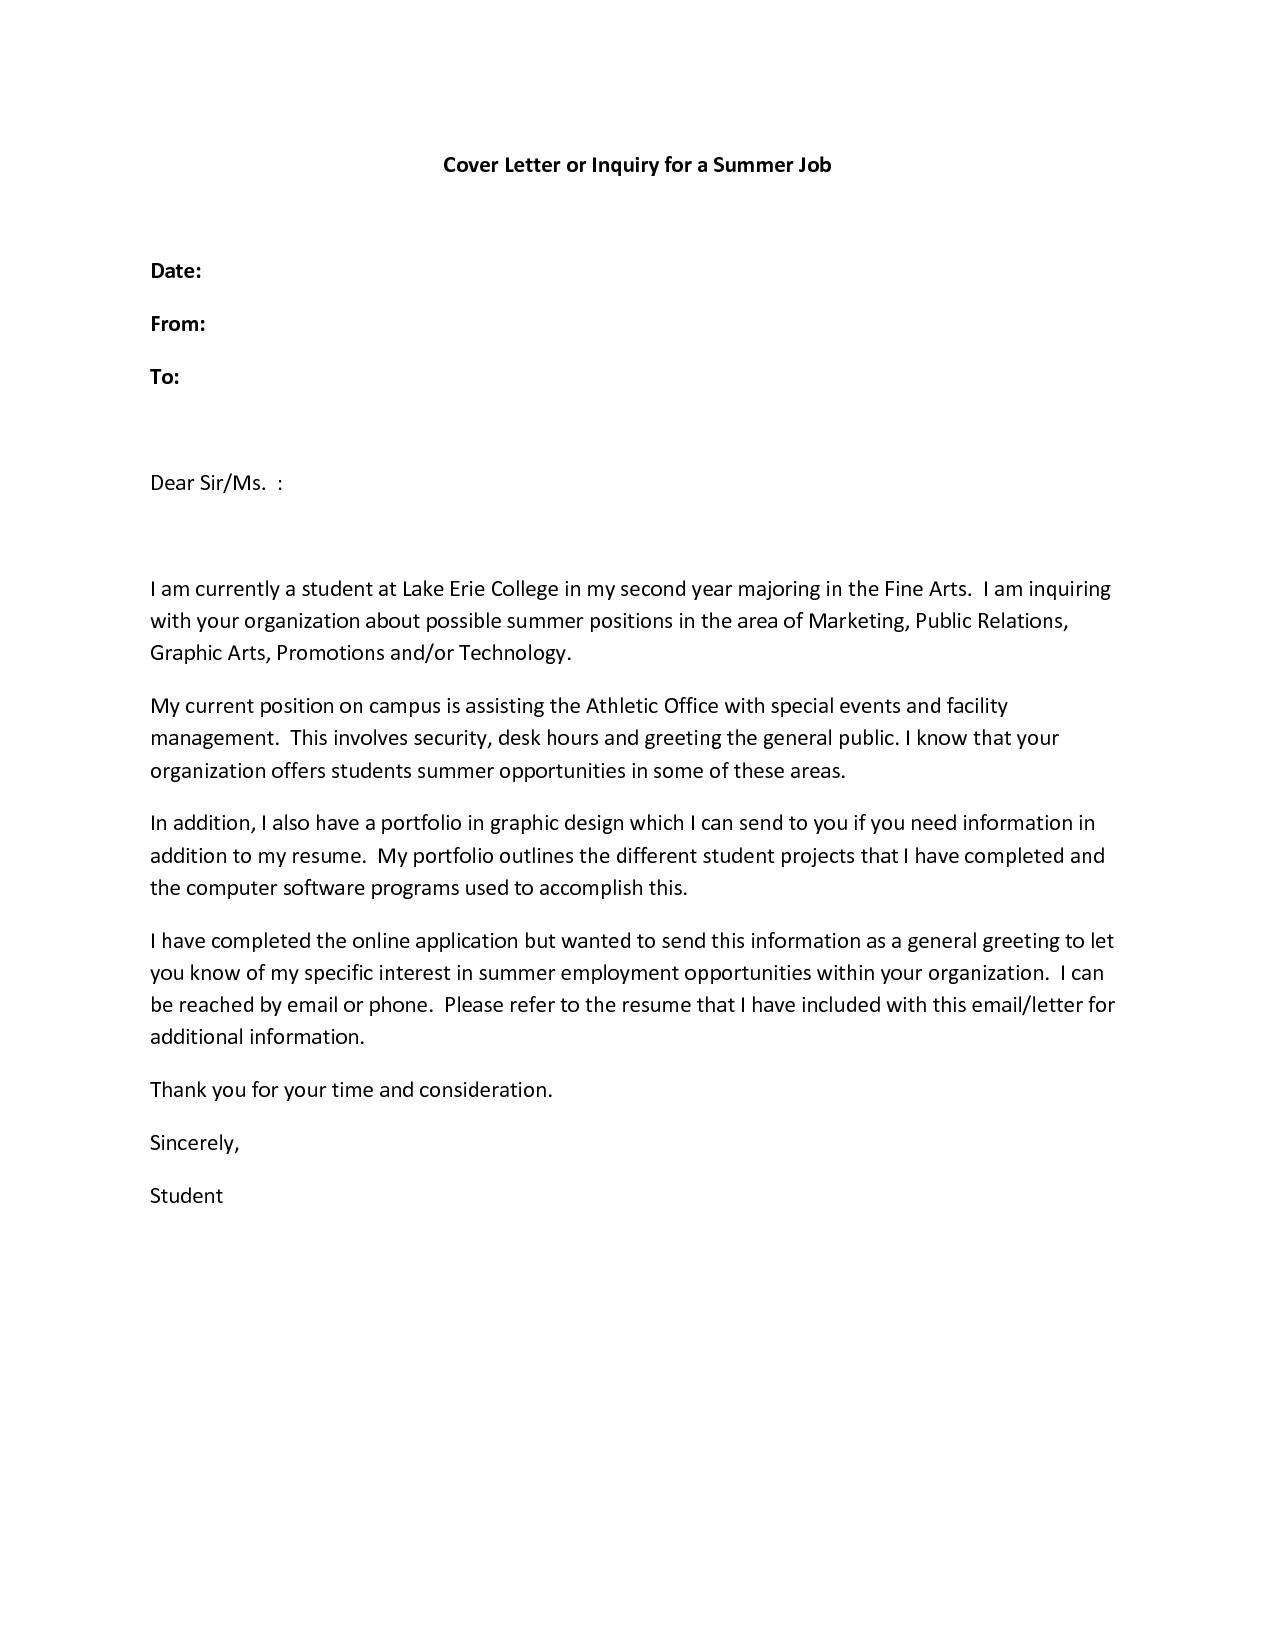 Resume Cover Letter Examples Summer Job Govt Jobcover